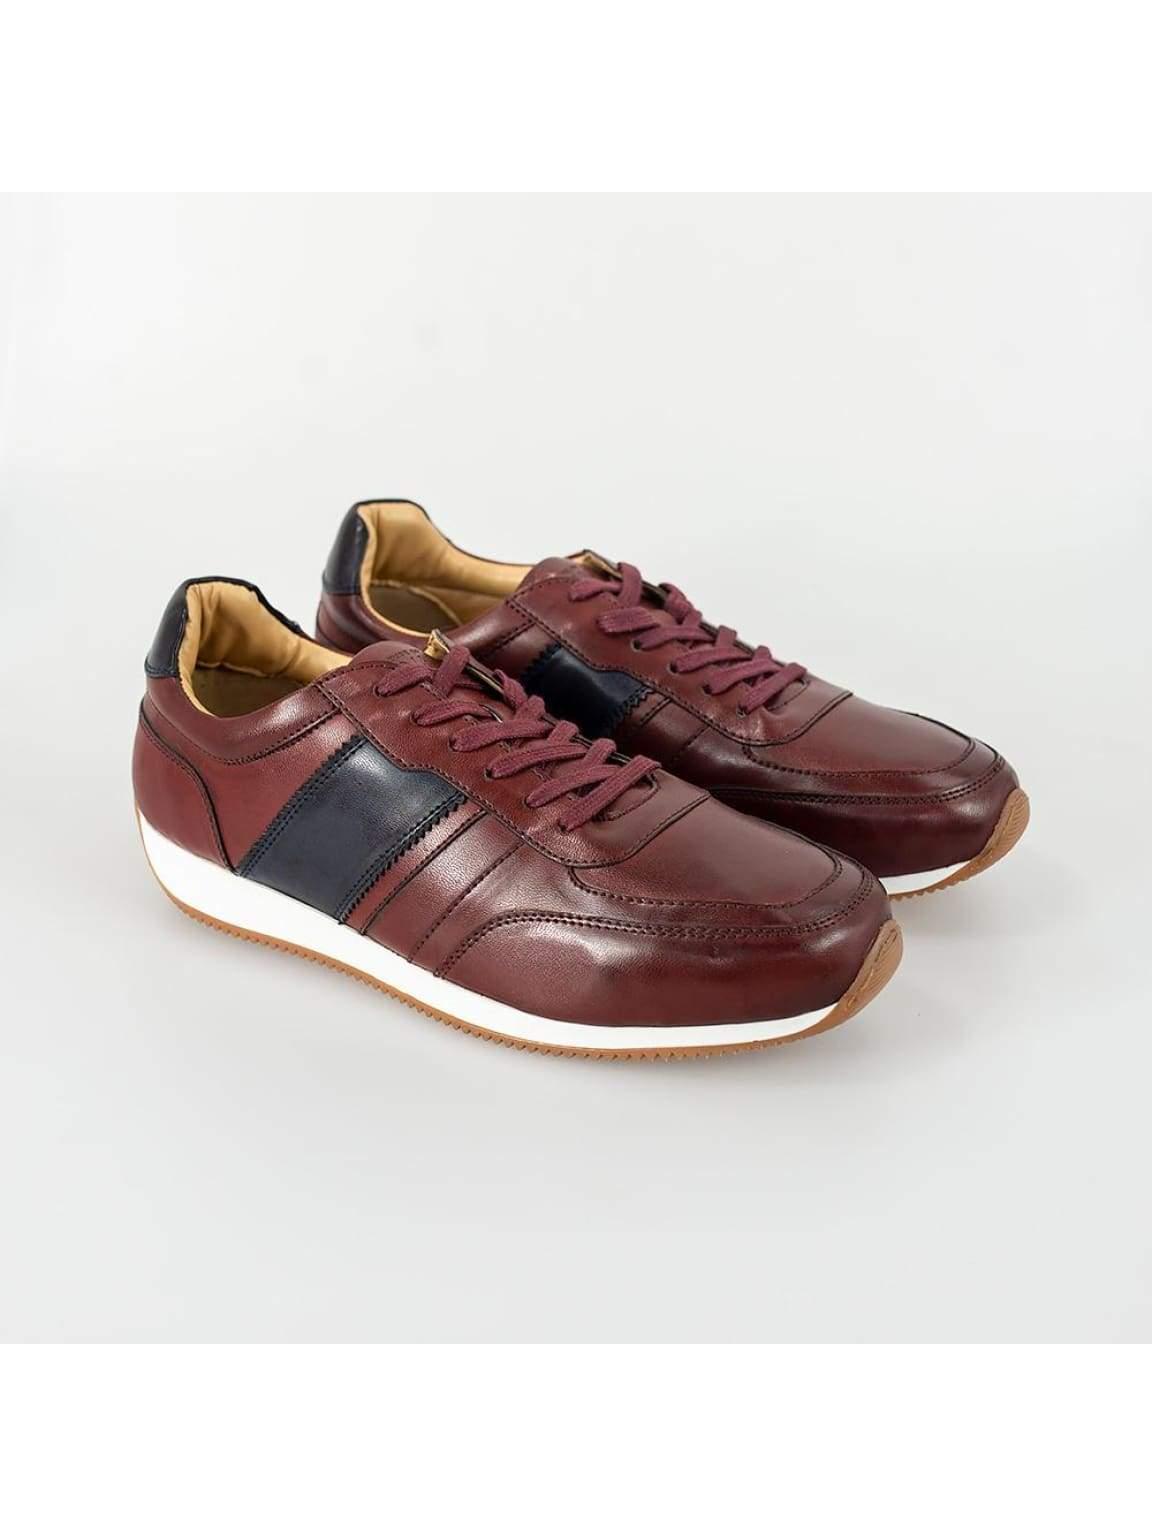 Cavani Fraser Bordo/Navy Trainers - UK7   EU41 - Shoes